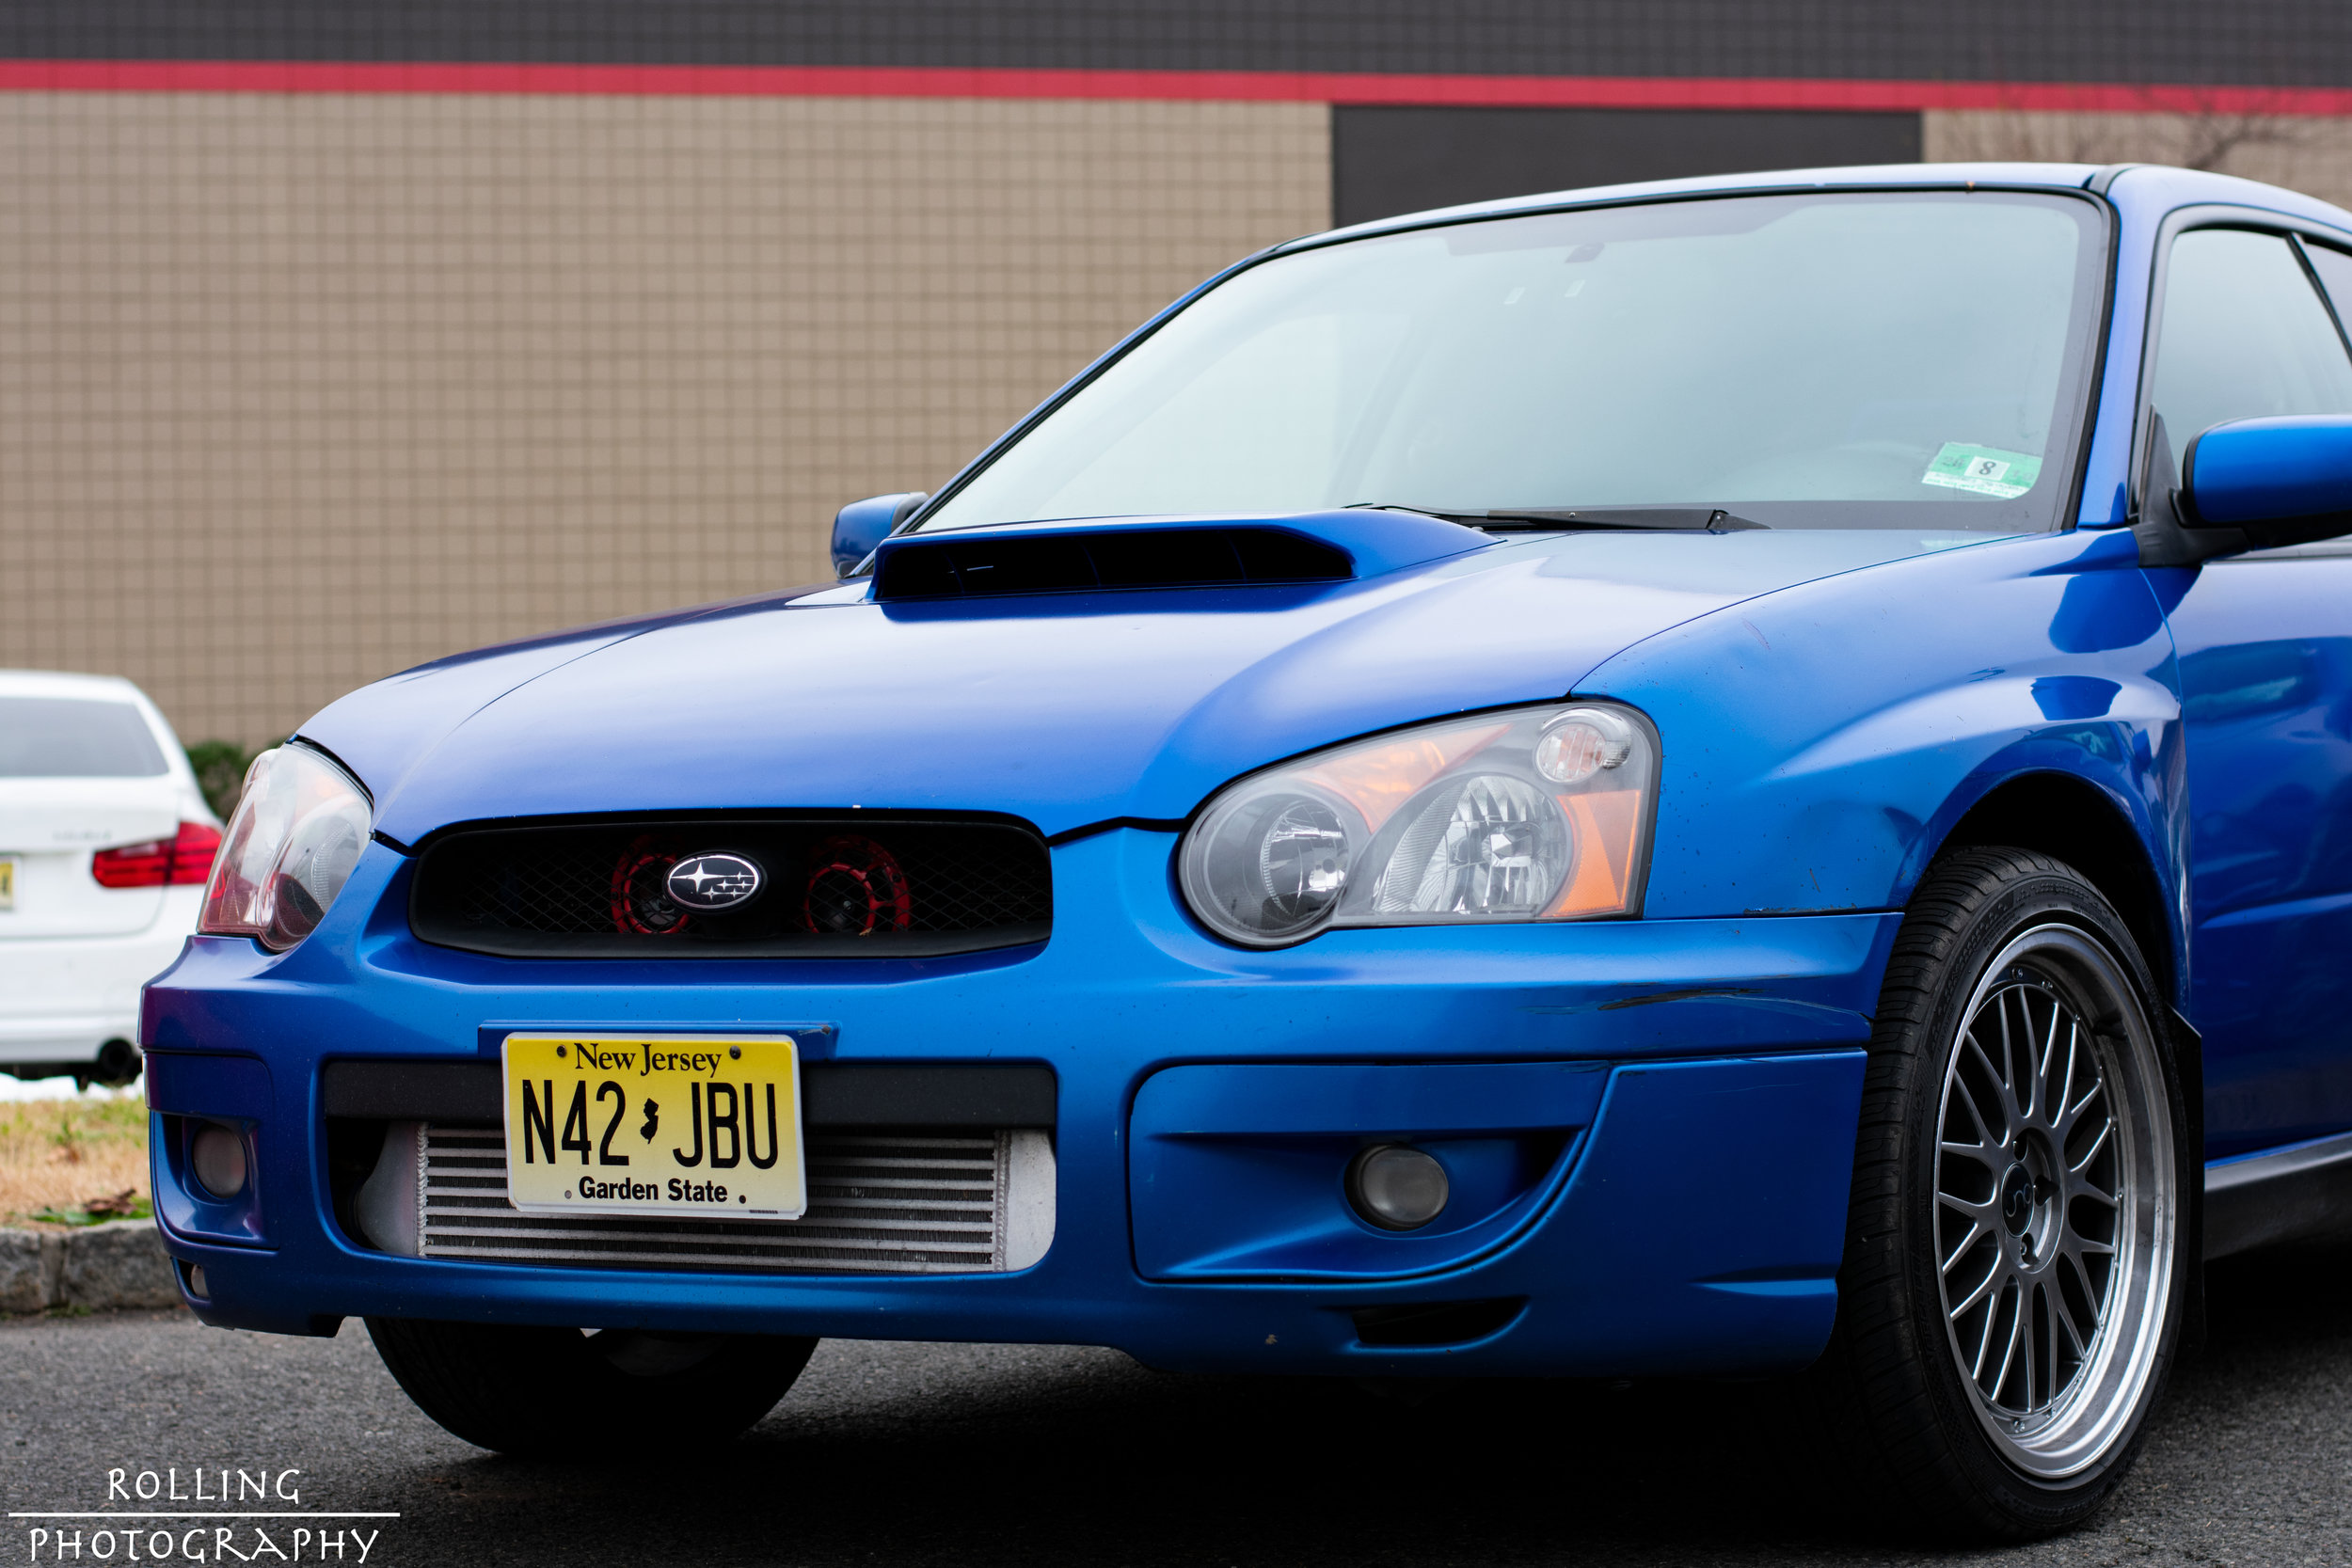 Subaru Impreza WRX STI  @blacksmok31   ISO 200, 50mm, f / 4.5 Shutter Speed 1/400